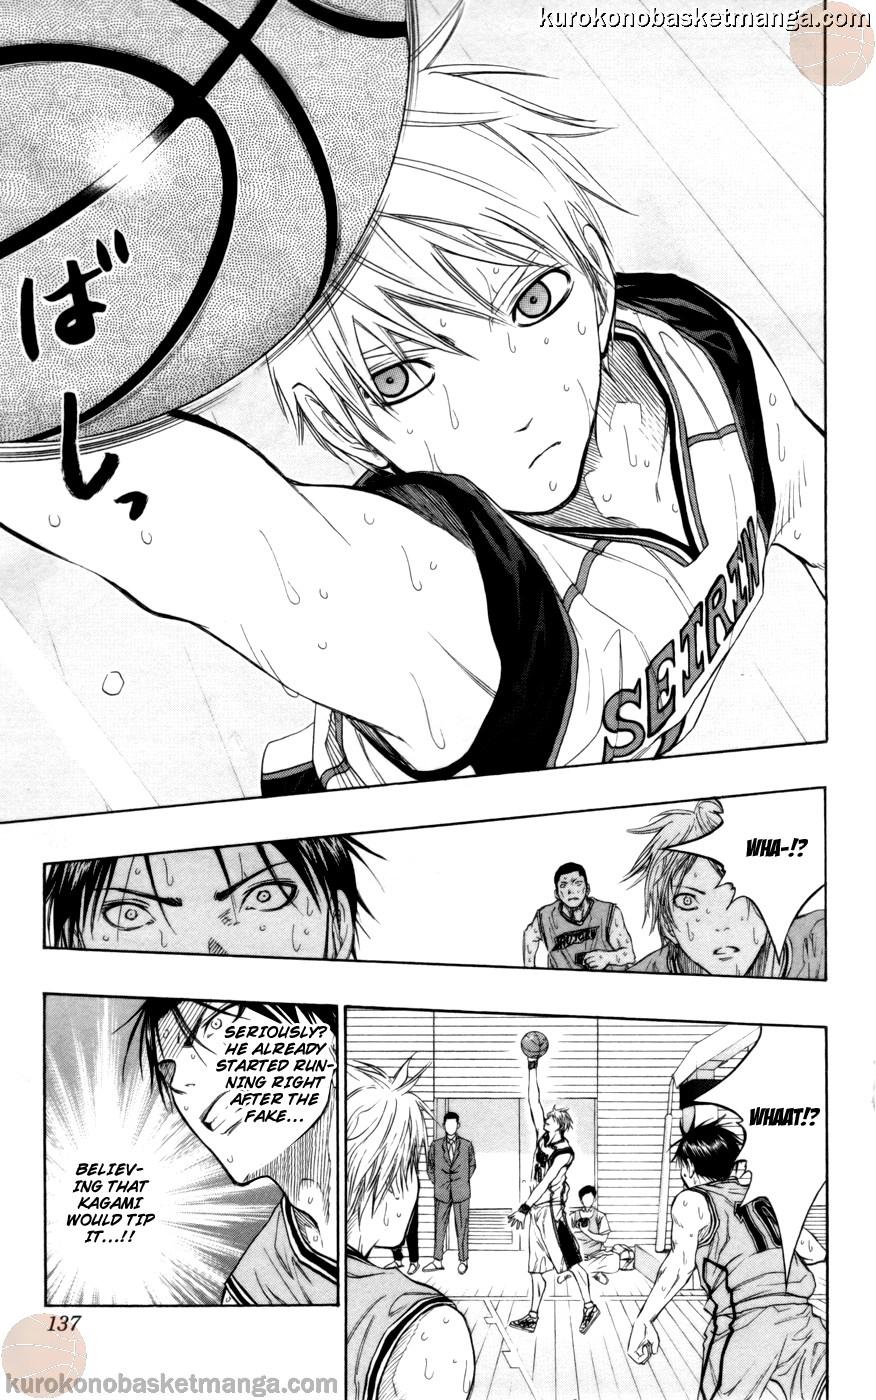 Kuroko no Basket Manga Chapter 87 - Image 11